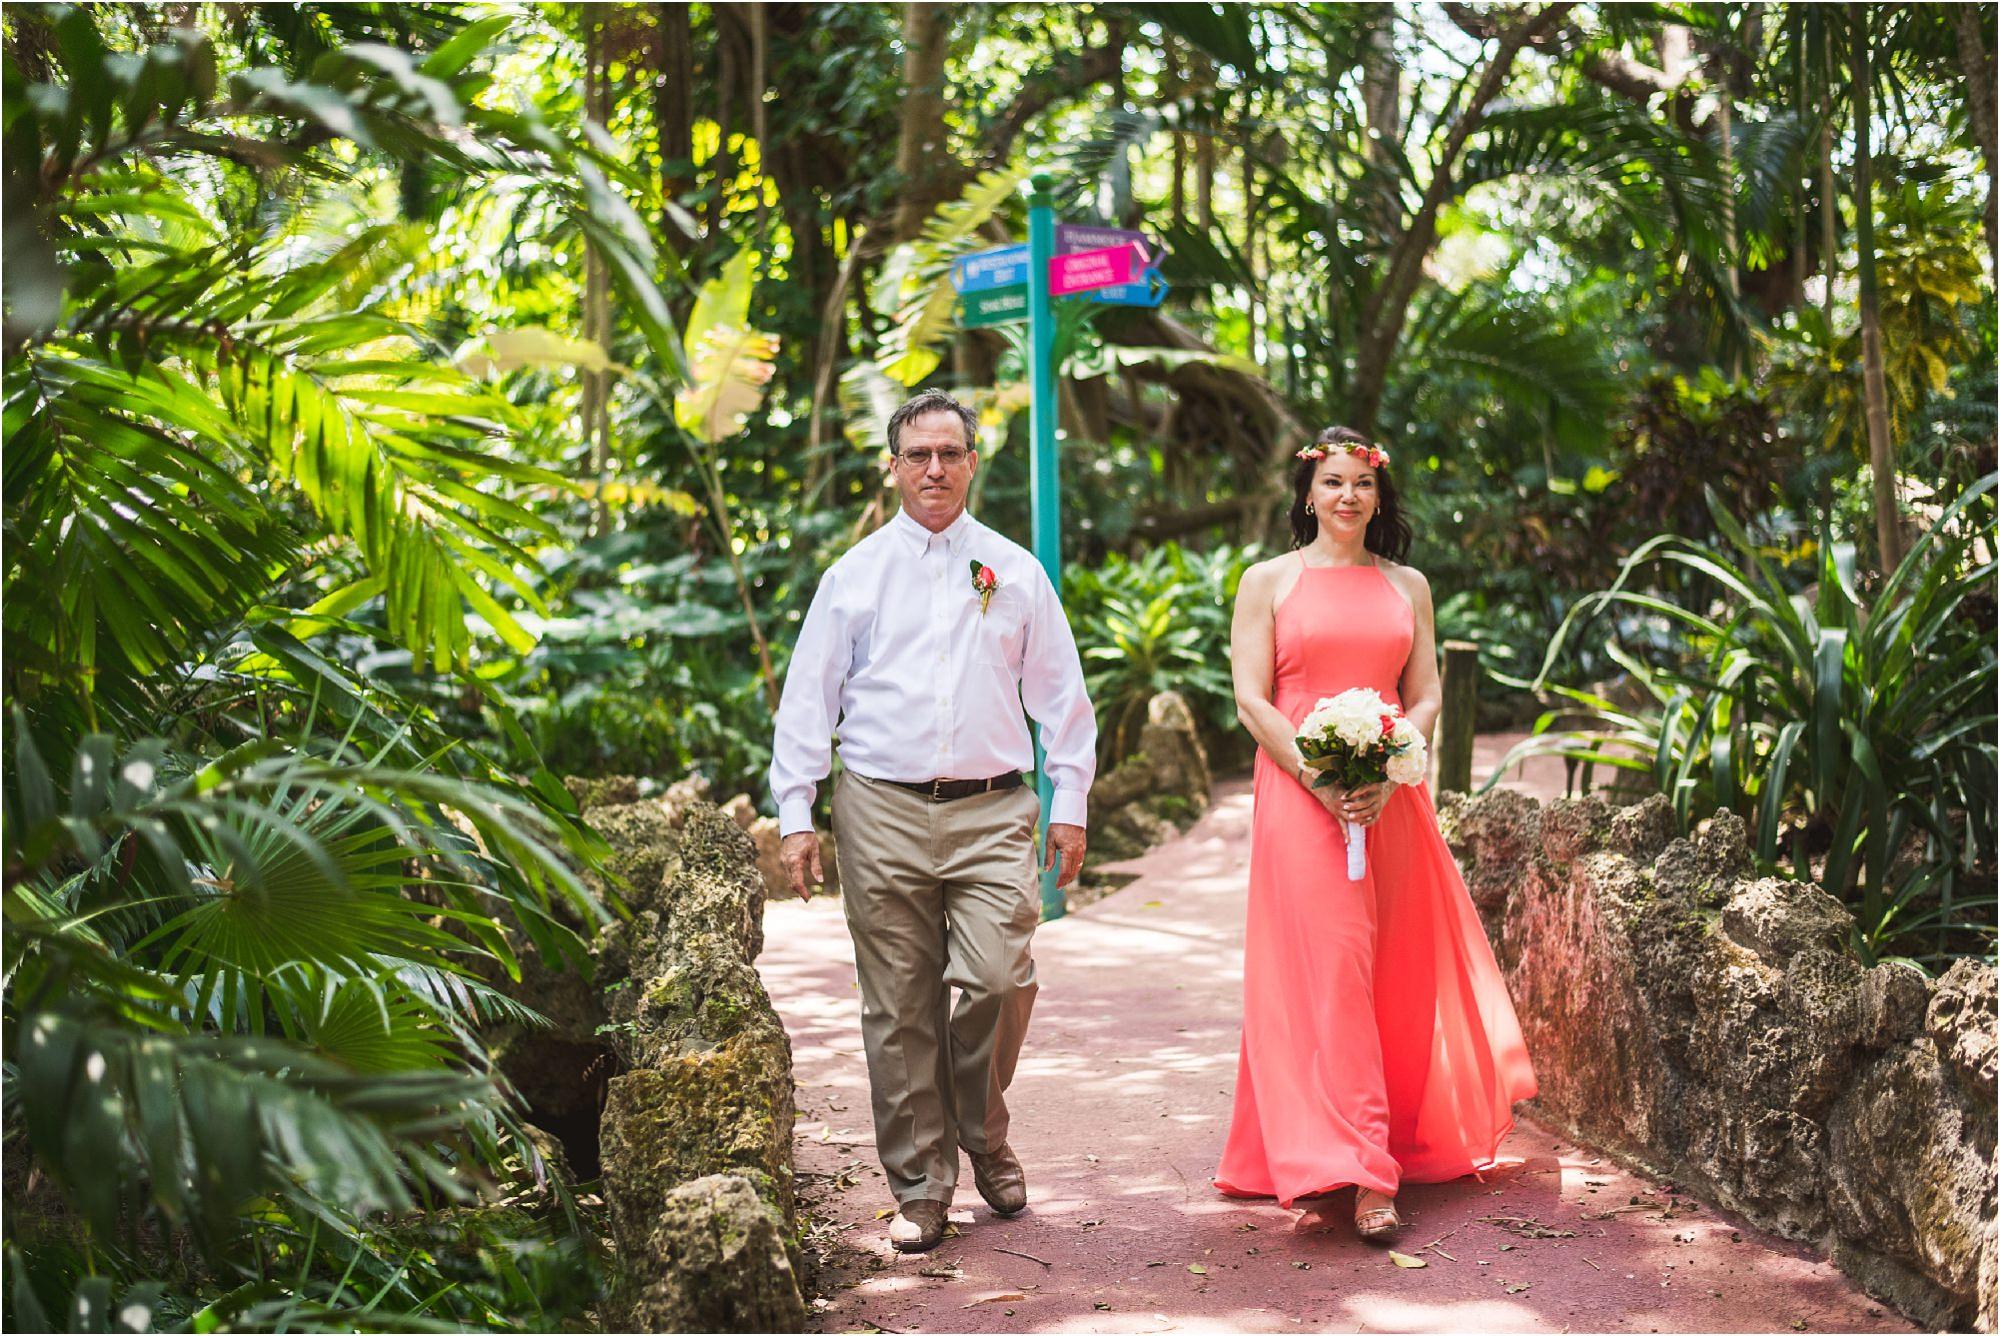 outdoor-rustic-pincrest-gardens-wedding-miami-photographer-jessenia-gonzalez_1026.jpg